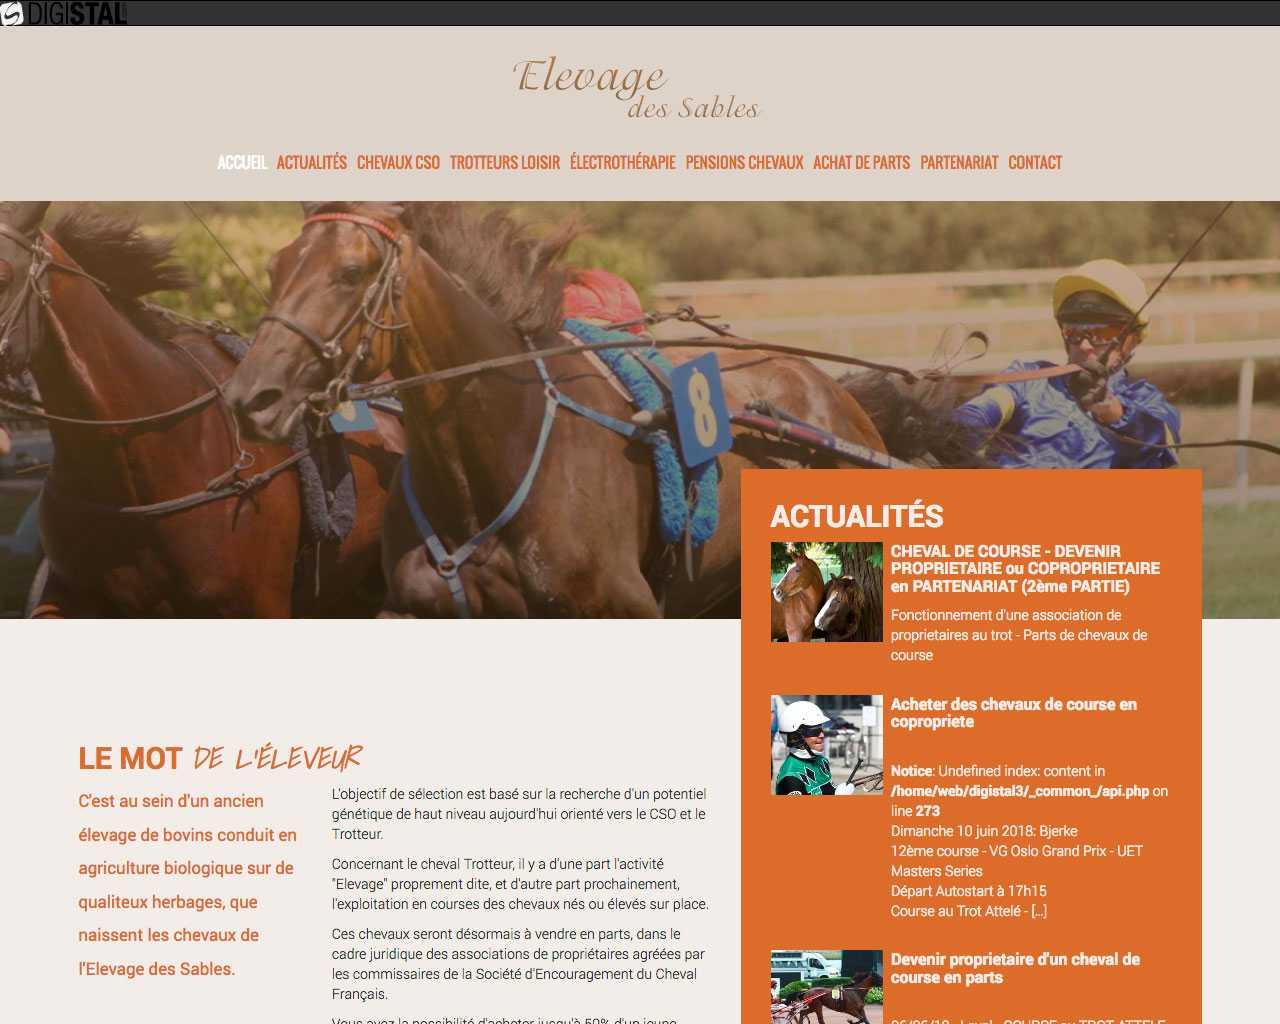 GAEC Des sables un site Dreamclic